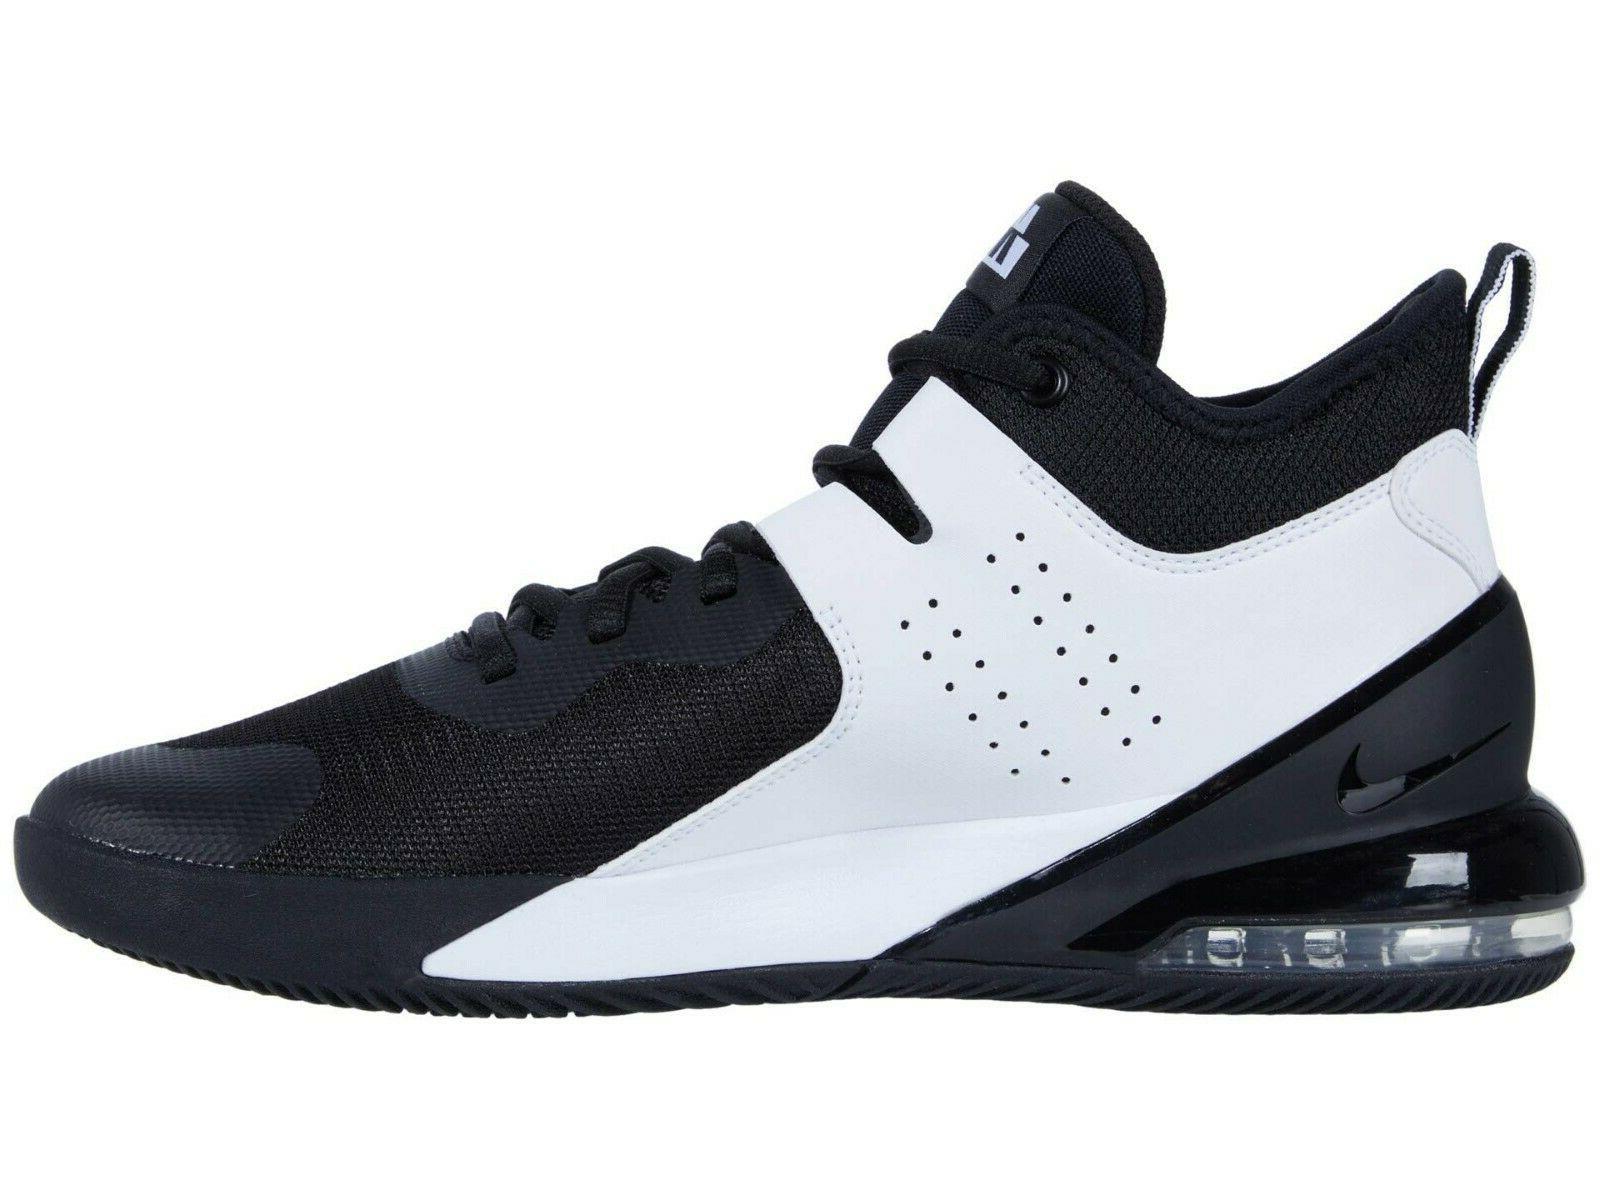 Nike AIR Mens Black/Black-White CI1396-004 Basketball Shoes